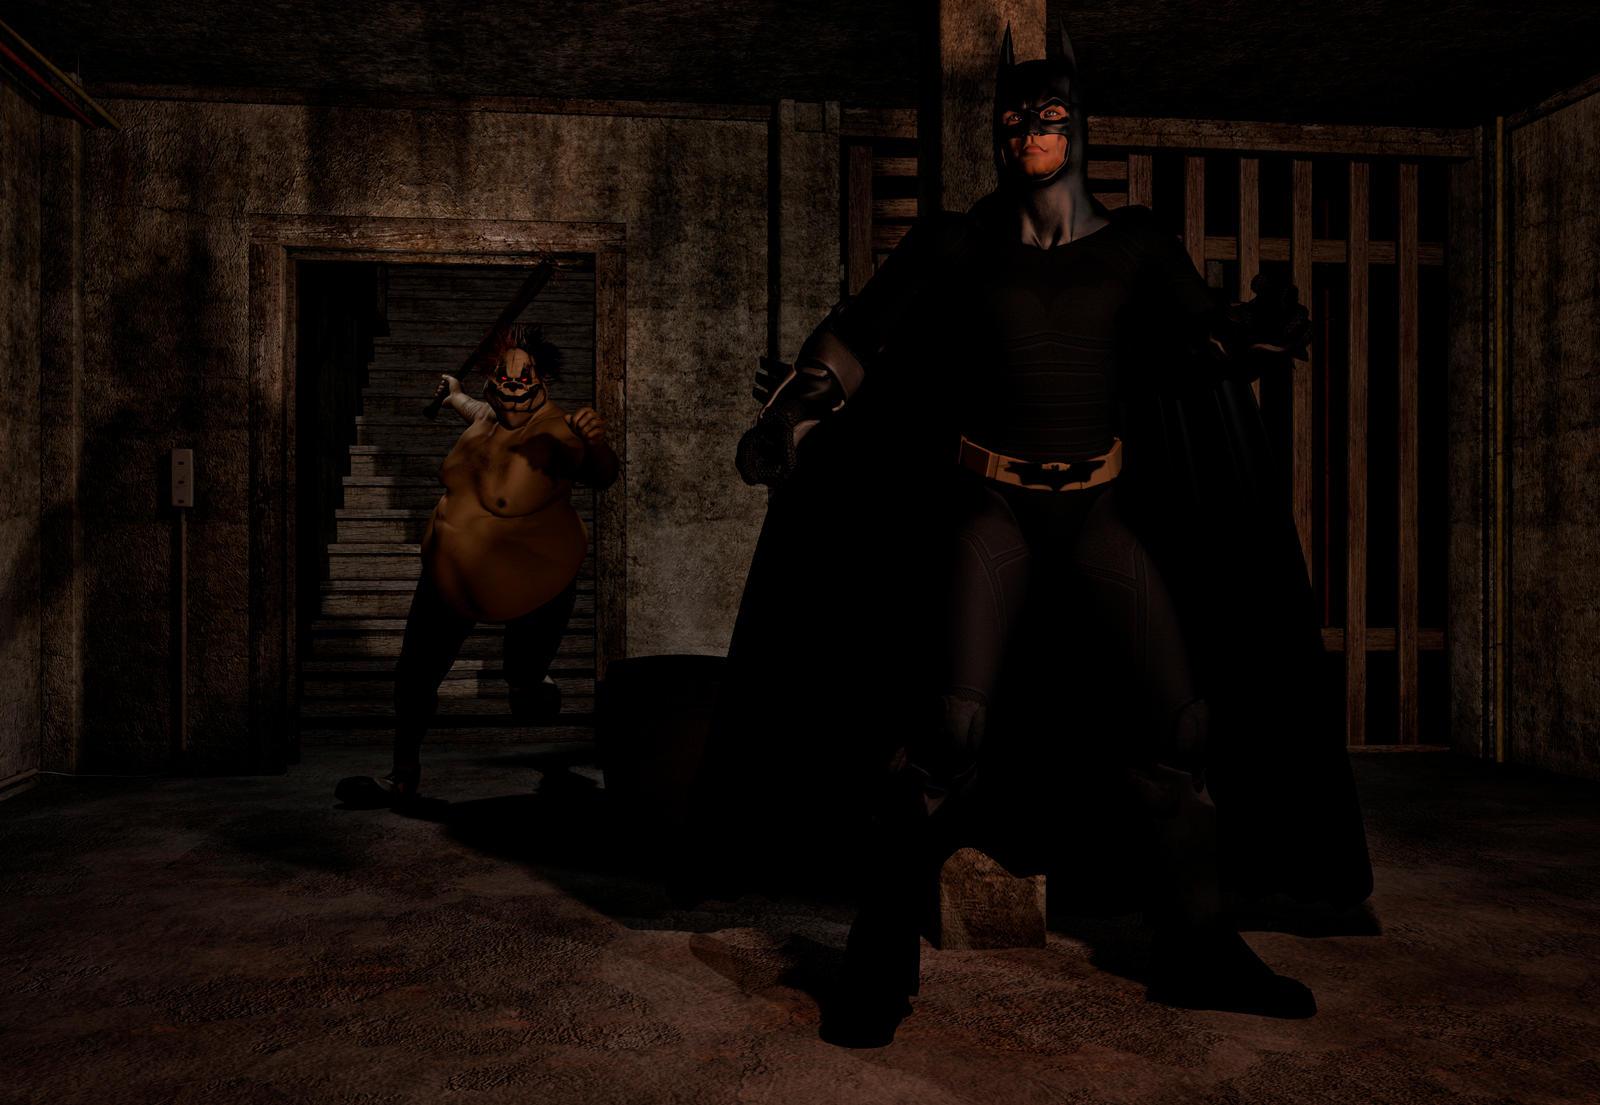 Batman vs Evil Joker scena 1 by hiram67 on DeviantArt